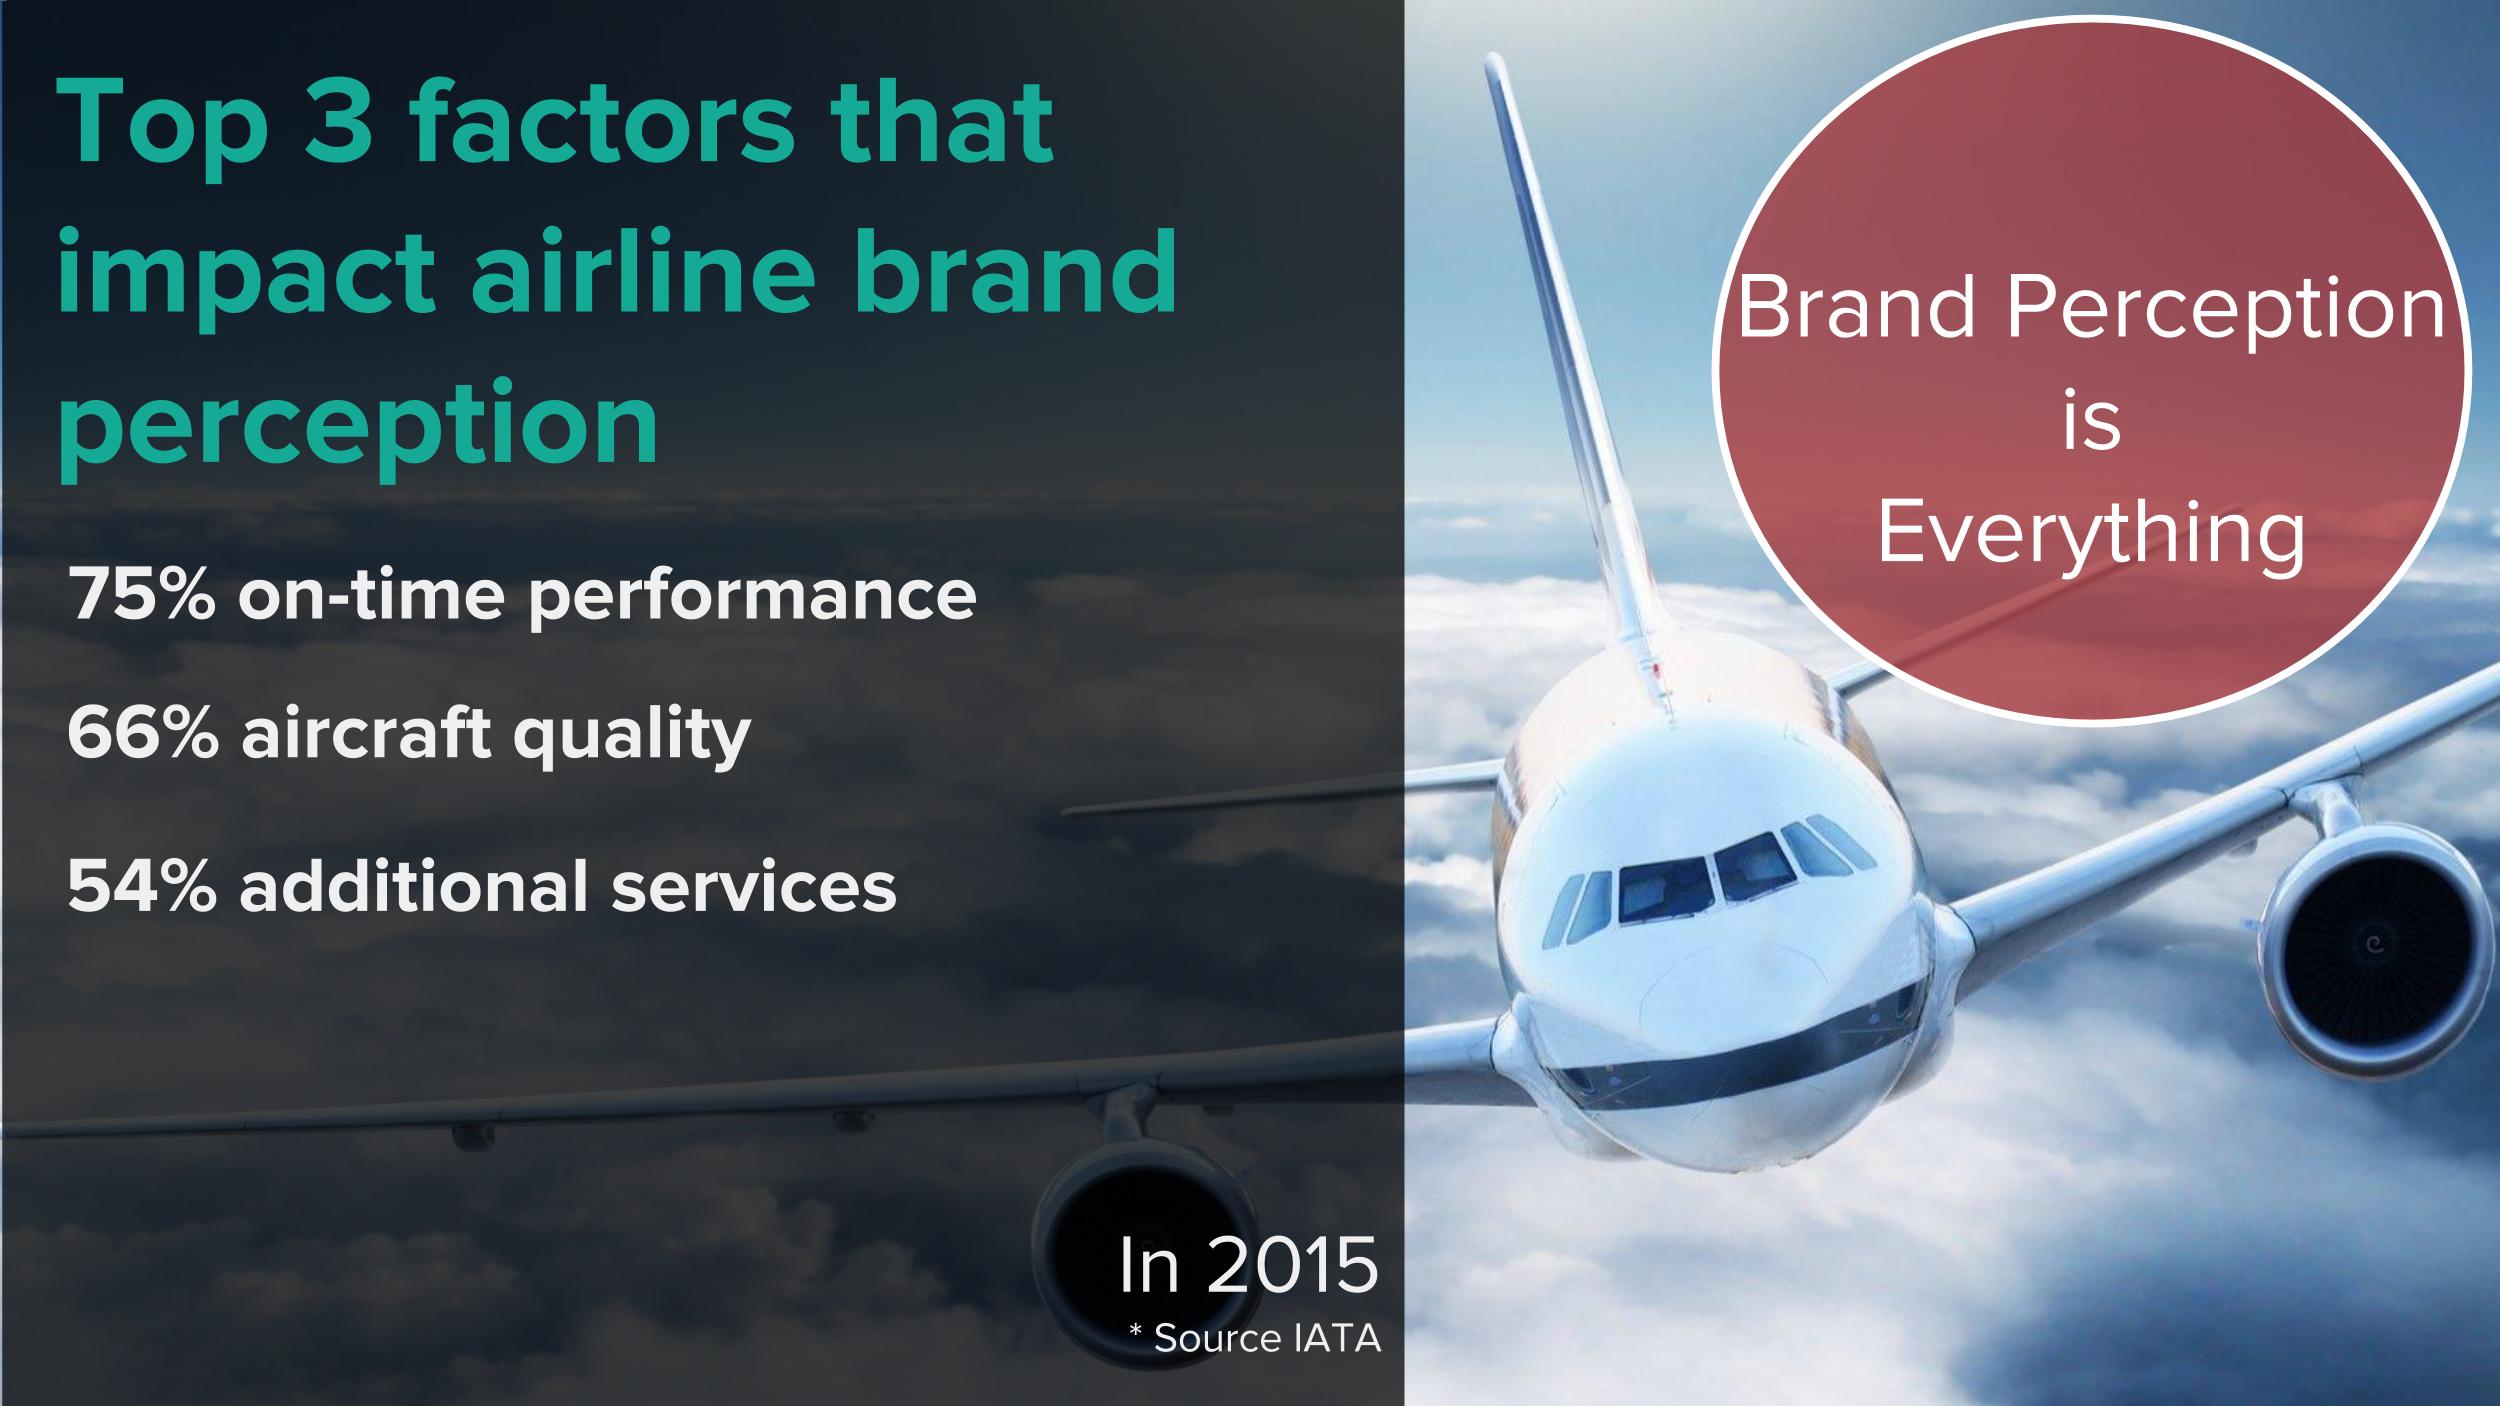 Sensor-Based Baggage Solution for Airlines factors